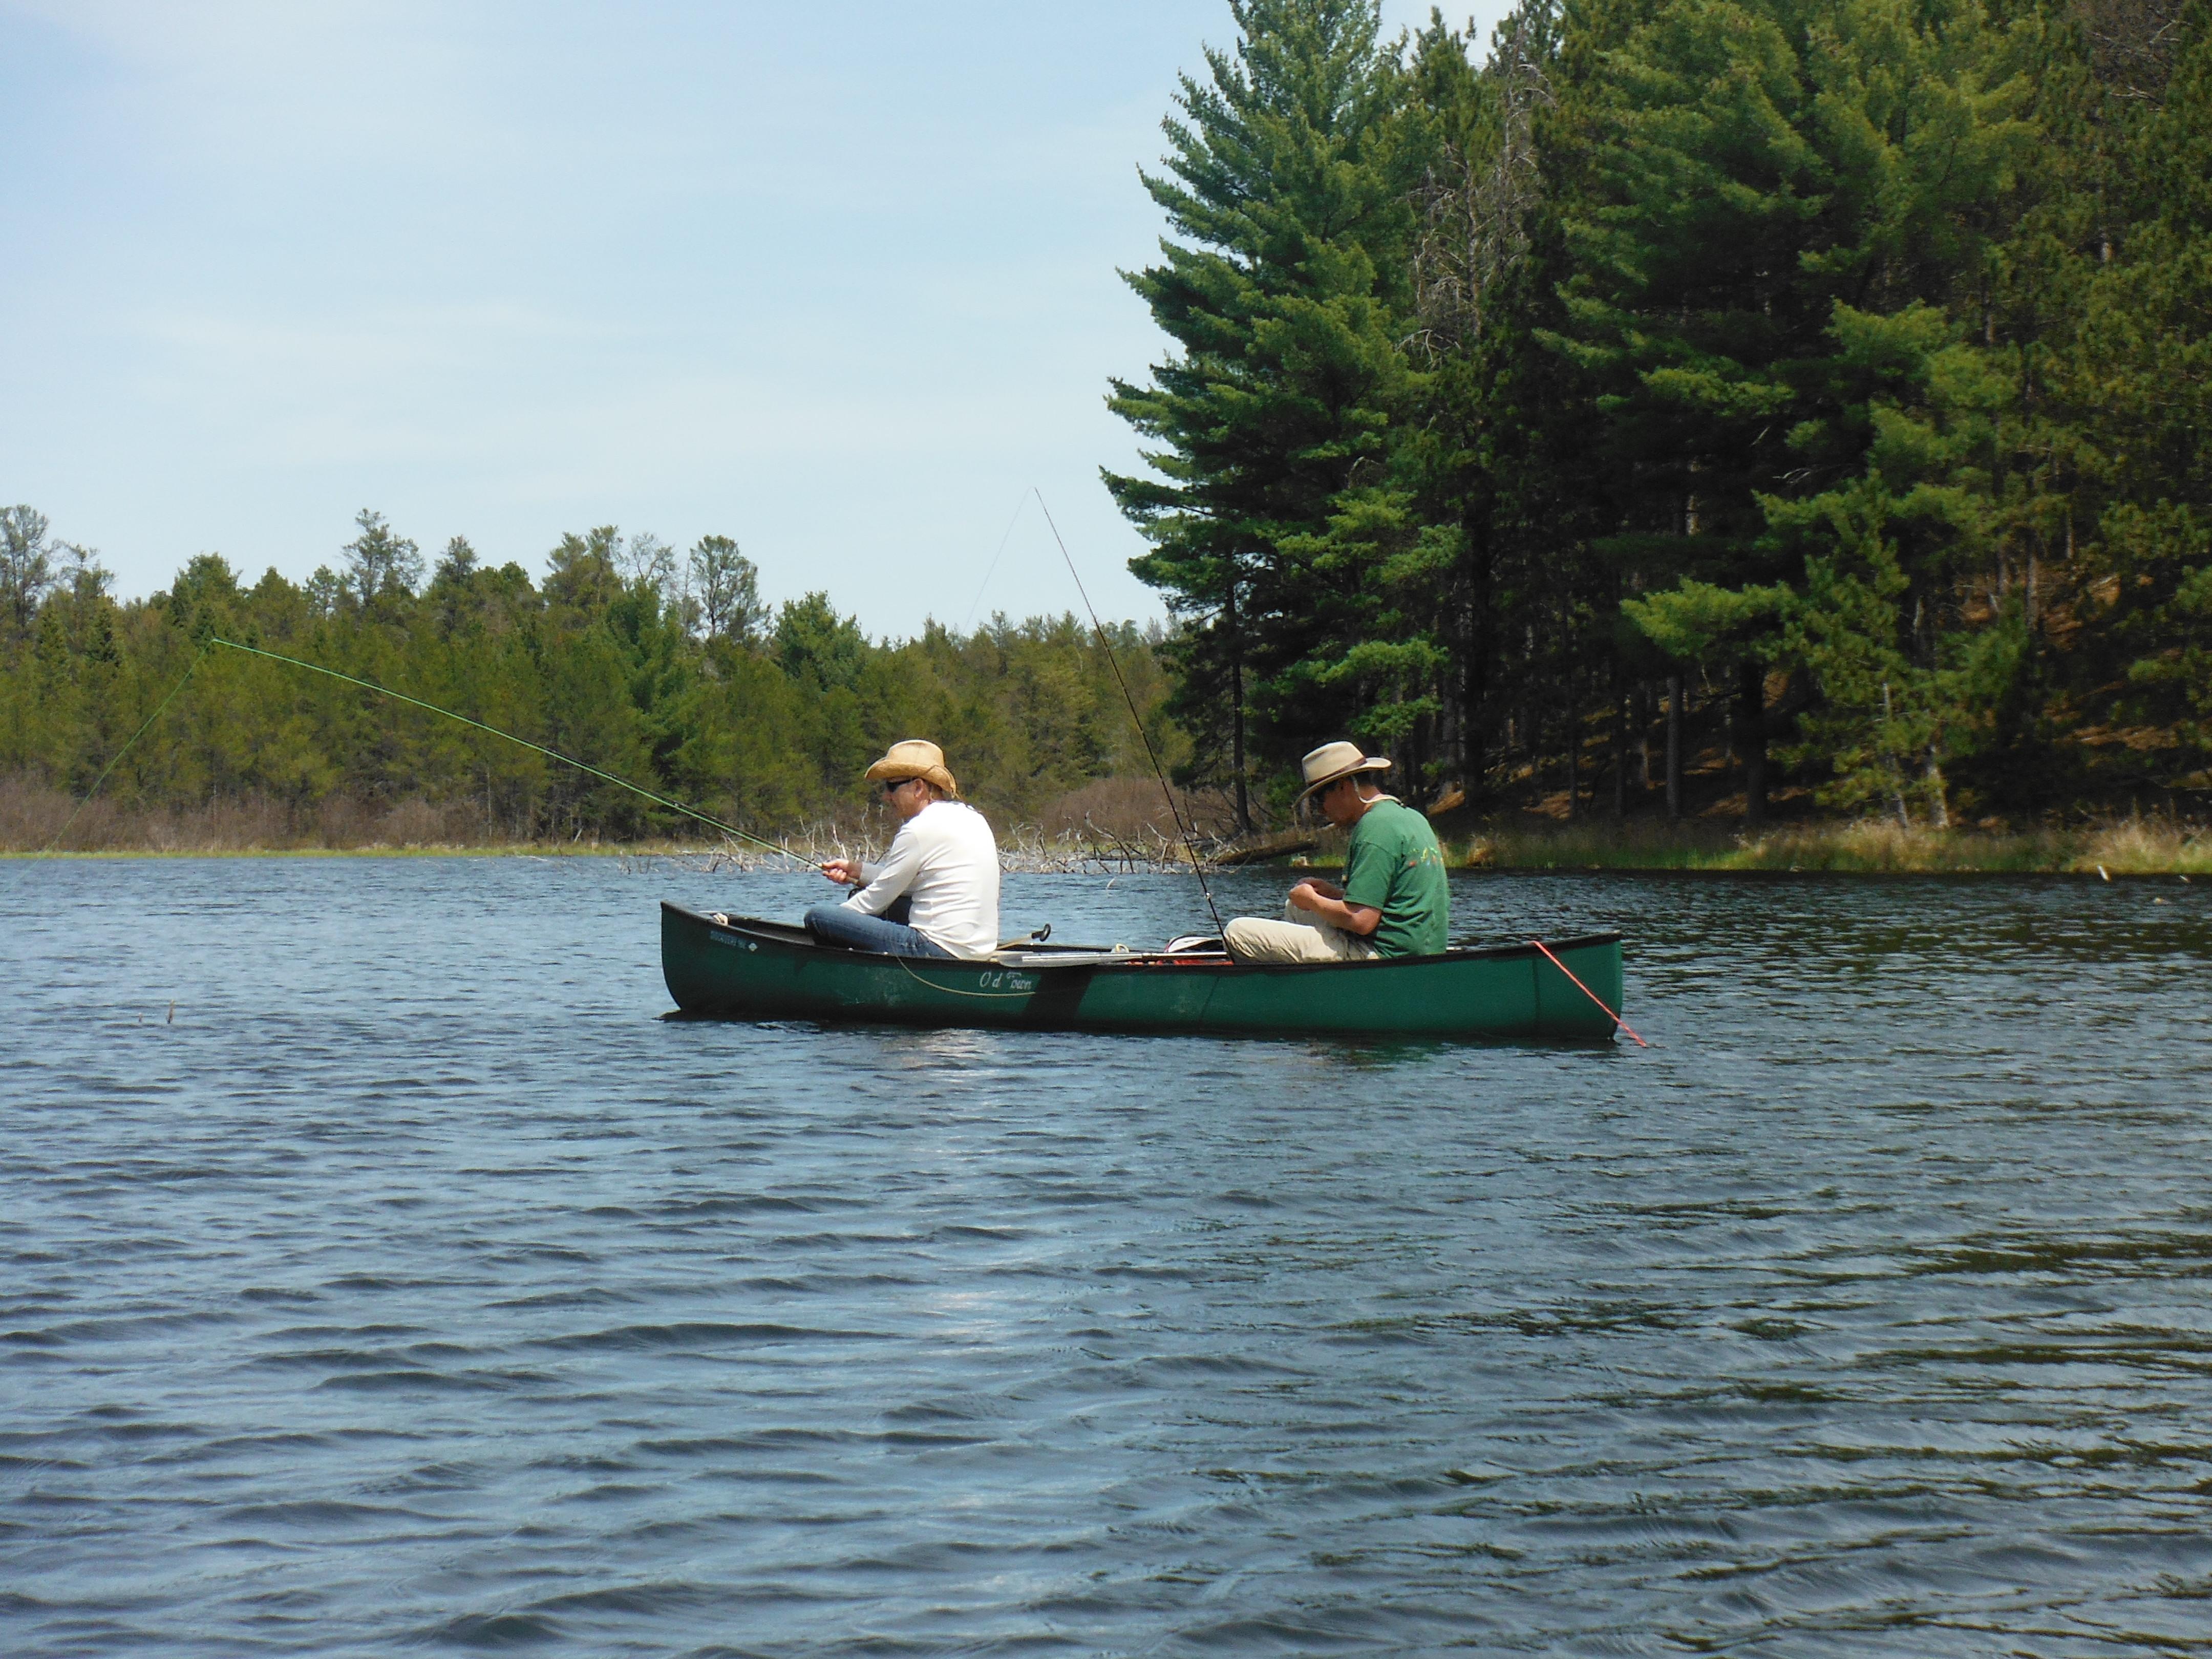 Joe and Todd afloat